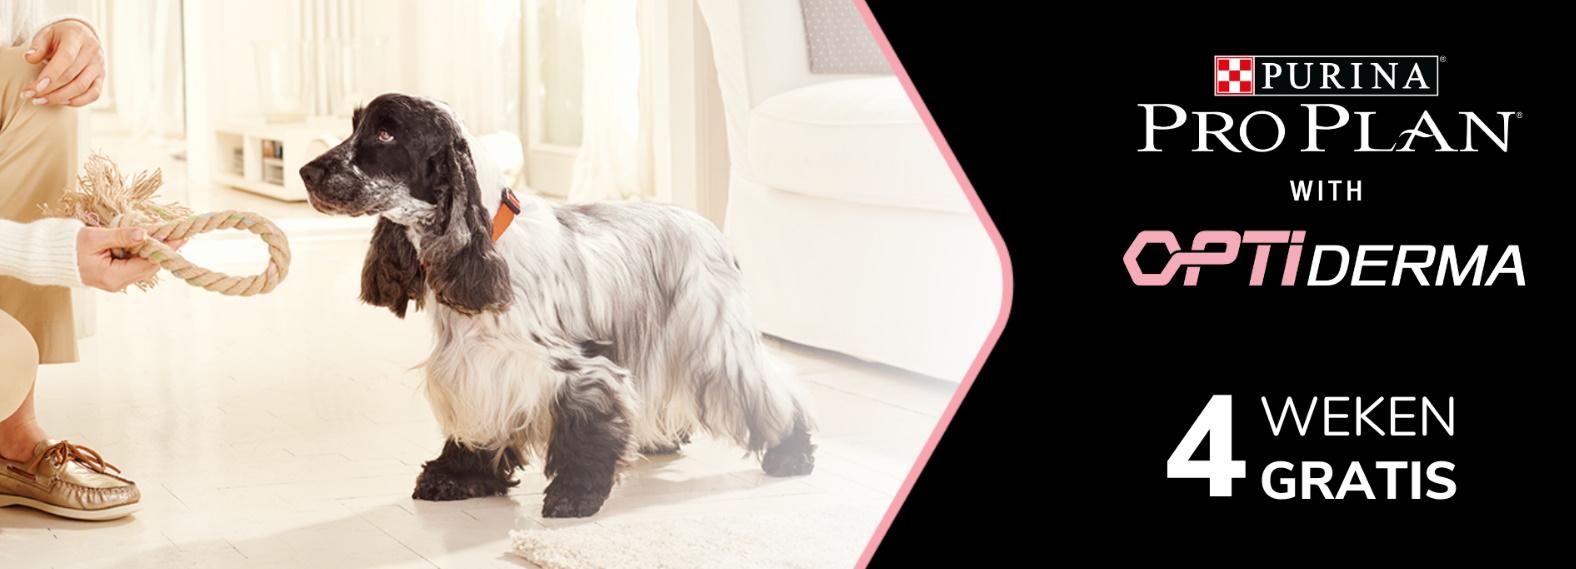 Test gratis Purina Pro Plan Optiderma hondenvoeding met Dogofriends